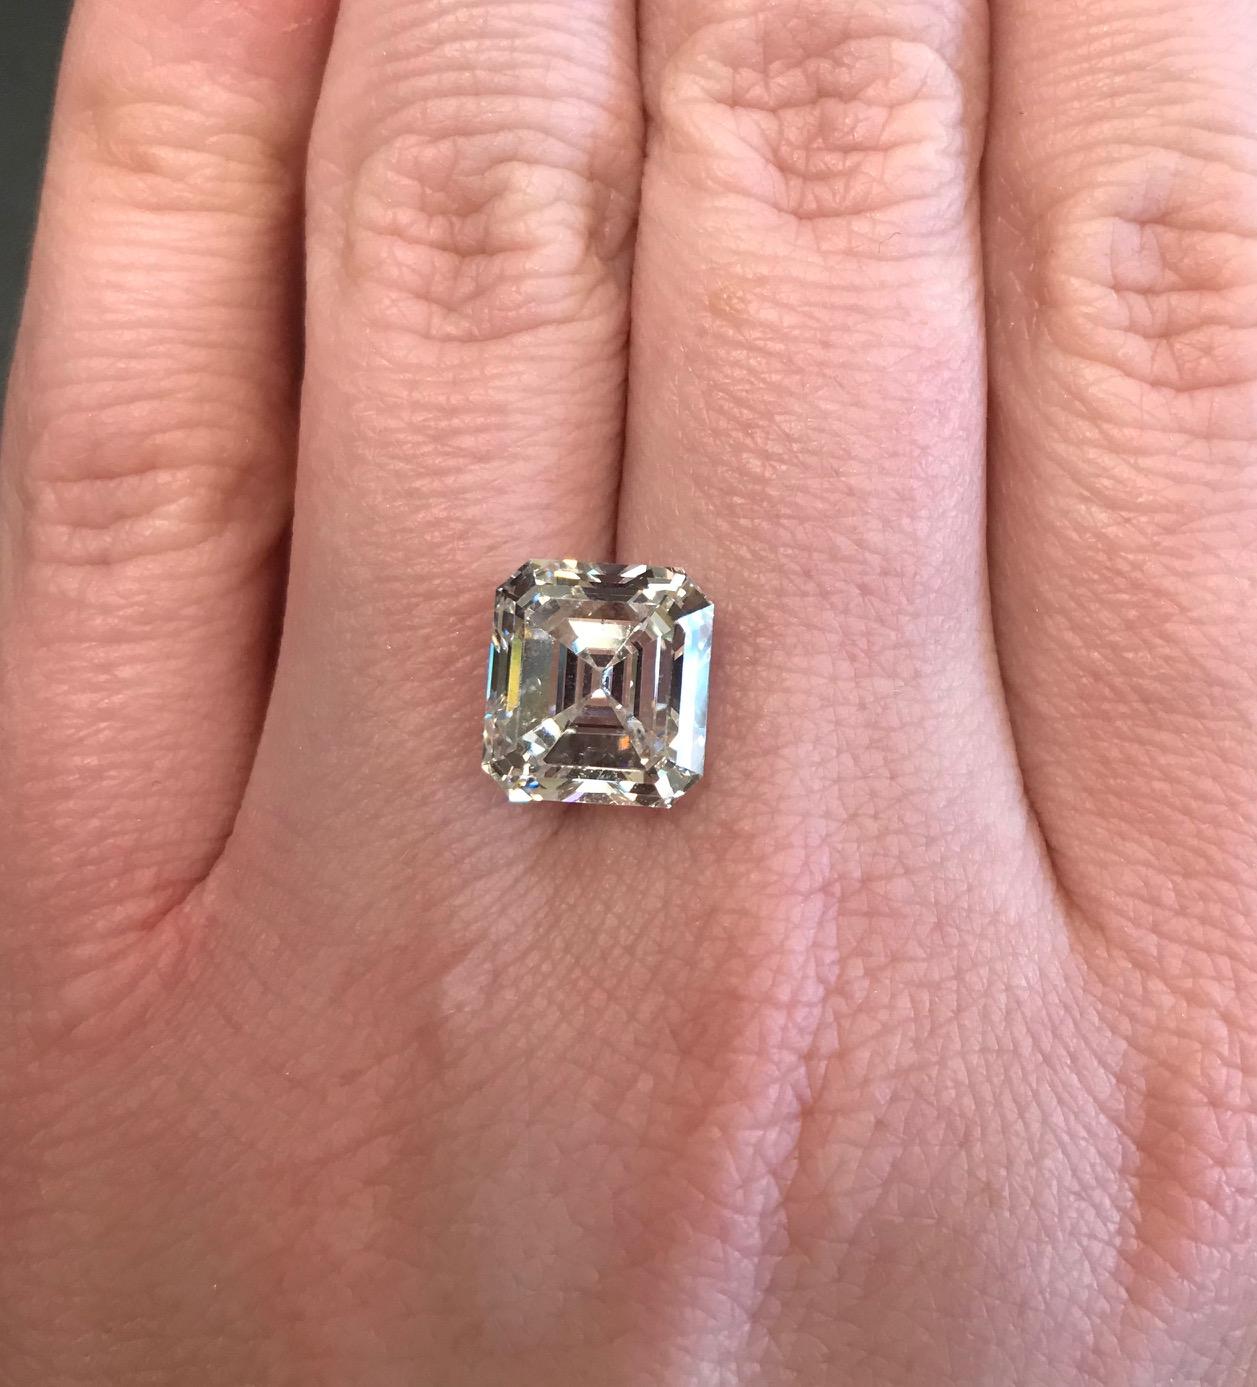 7.11 CTTW Emerald Cut Diamond - Alan Furman & Co